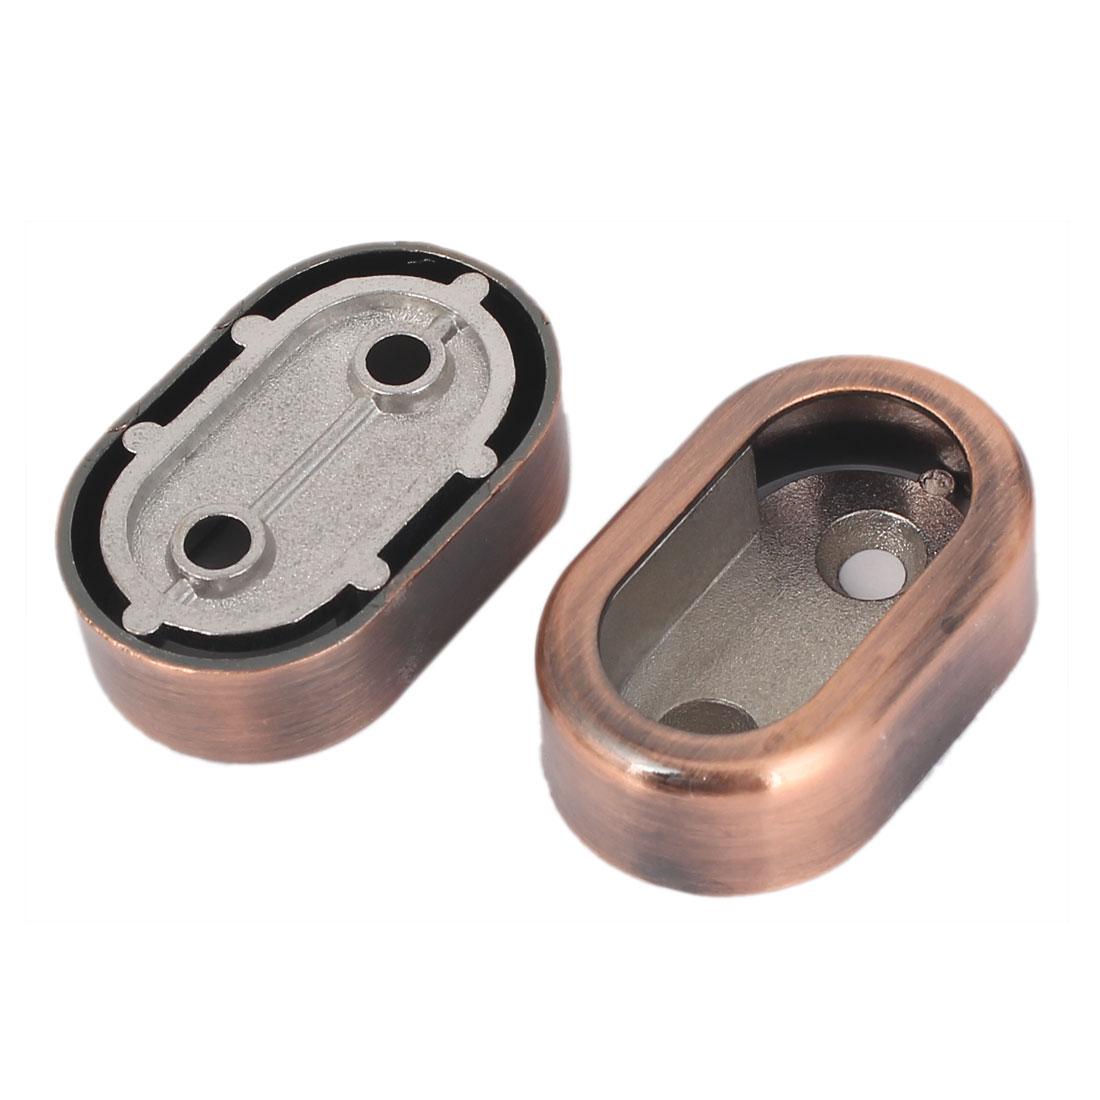 Cabinet Closet Metal Rod Flange Wardrobe Rail Support Copper 2pcs